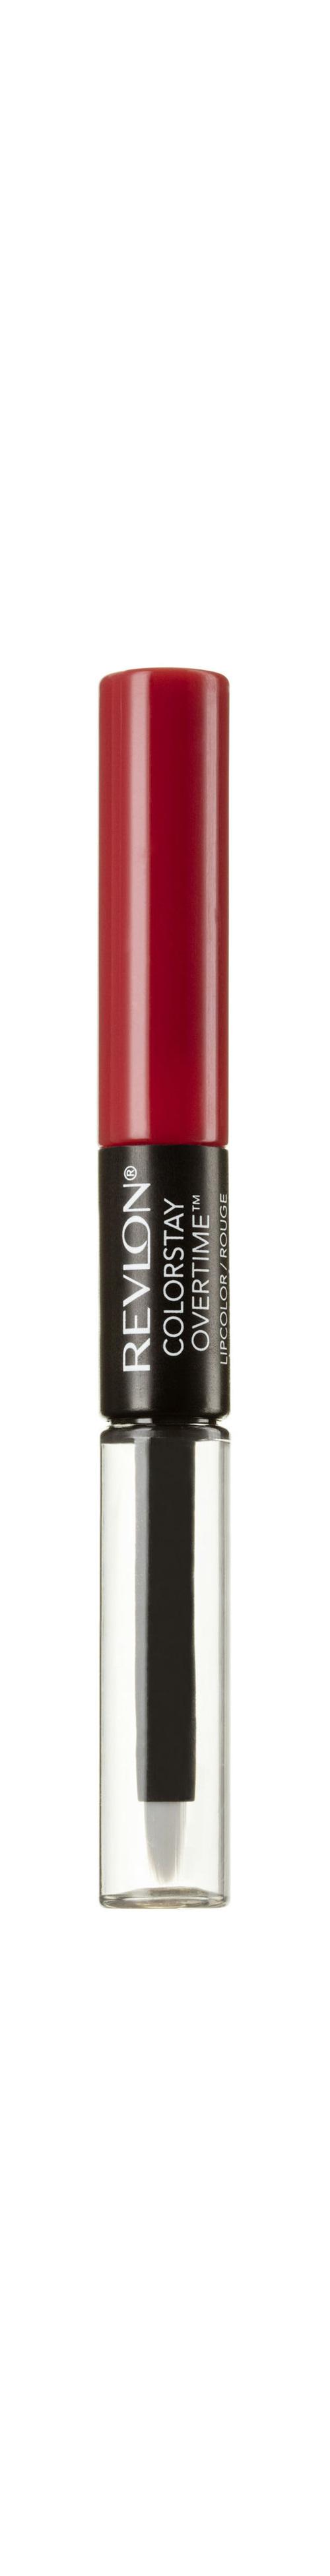 Revlon Colorstay Overtime™ Lipcolor Forever Scarlet